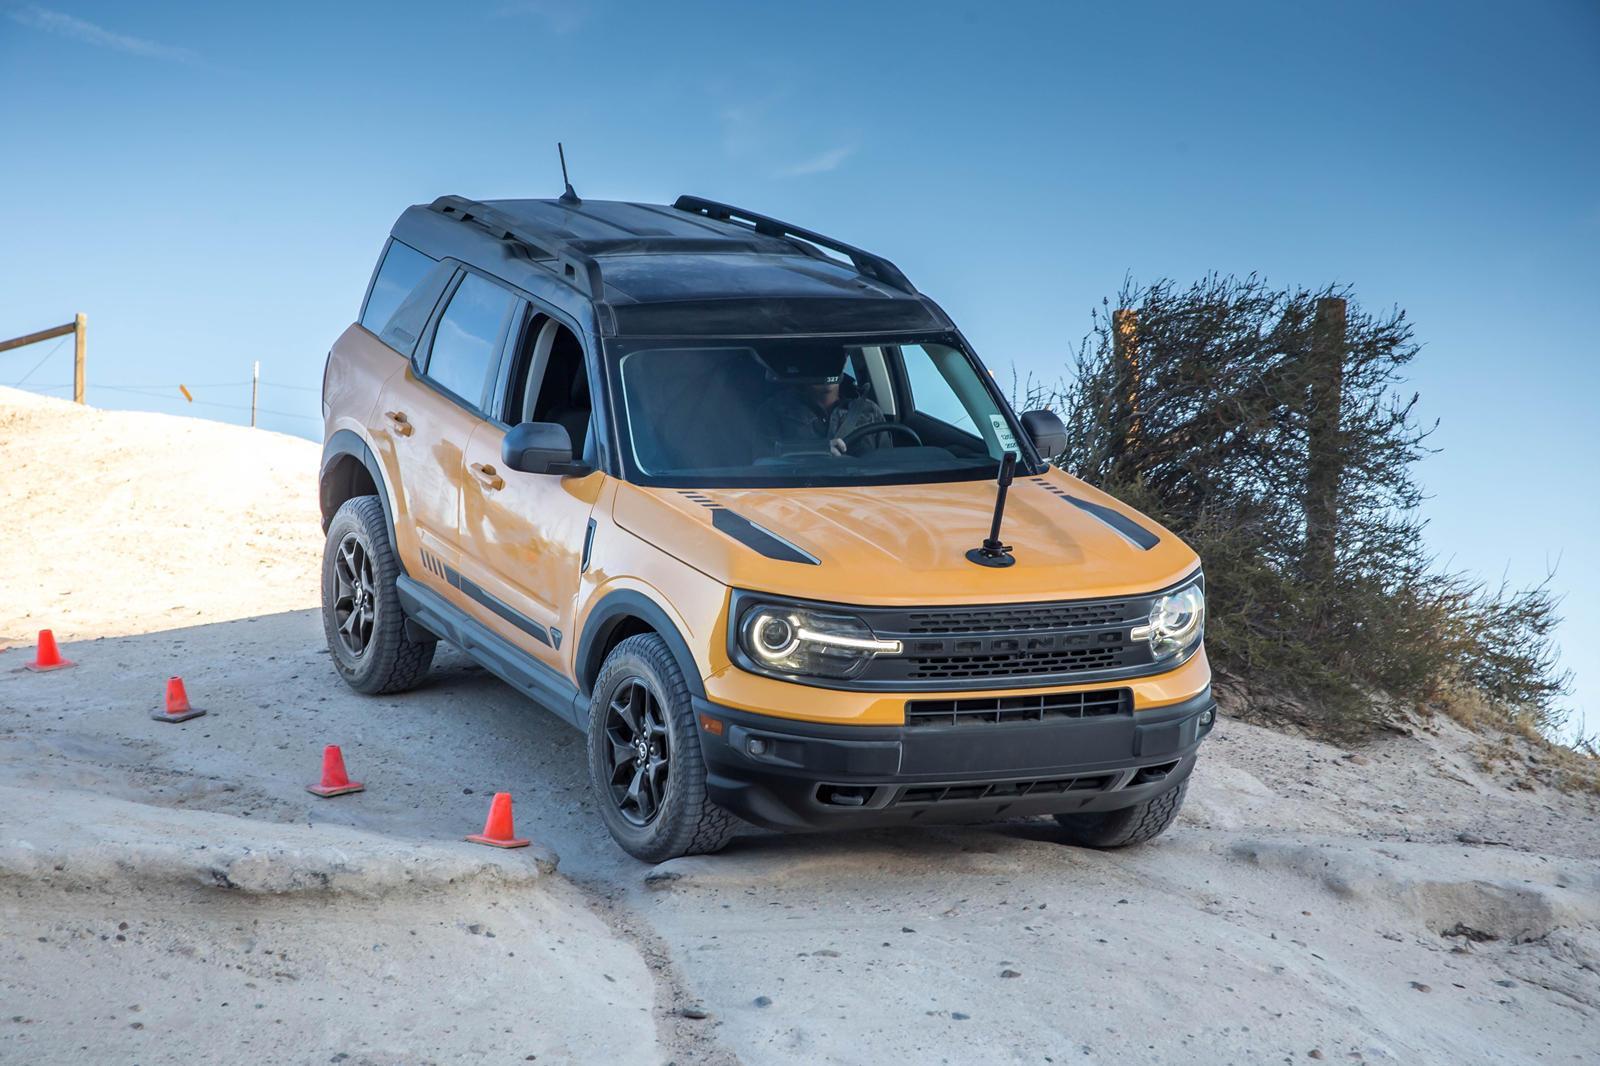 Ford Dealer Demands Bronco Sport Back After Selling It By Mistake